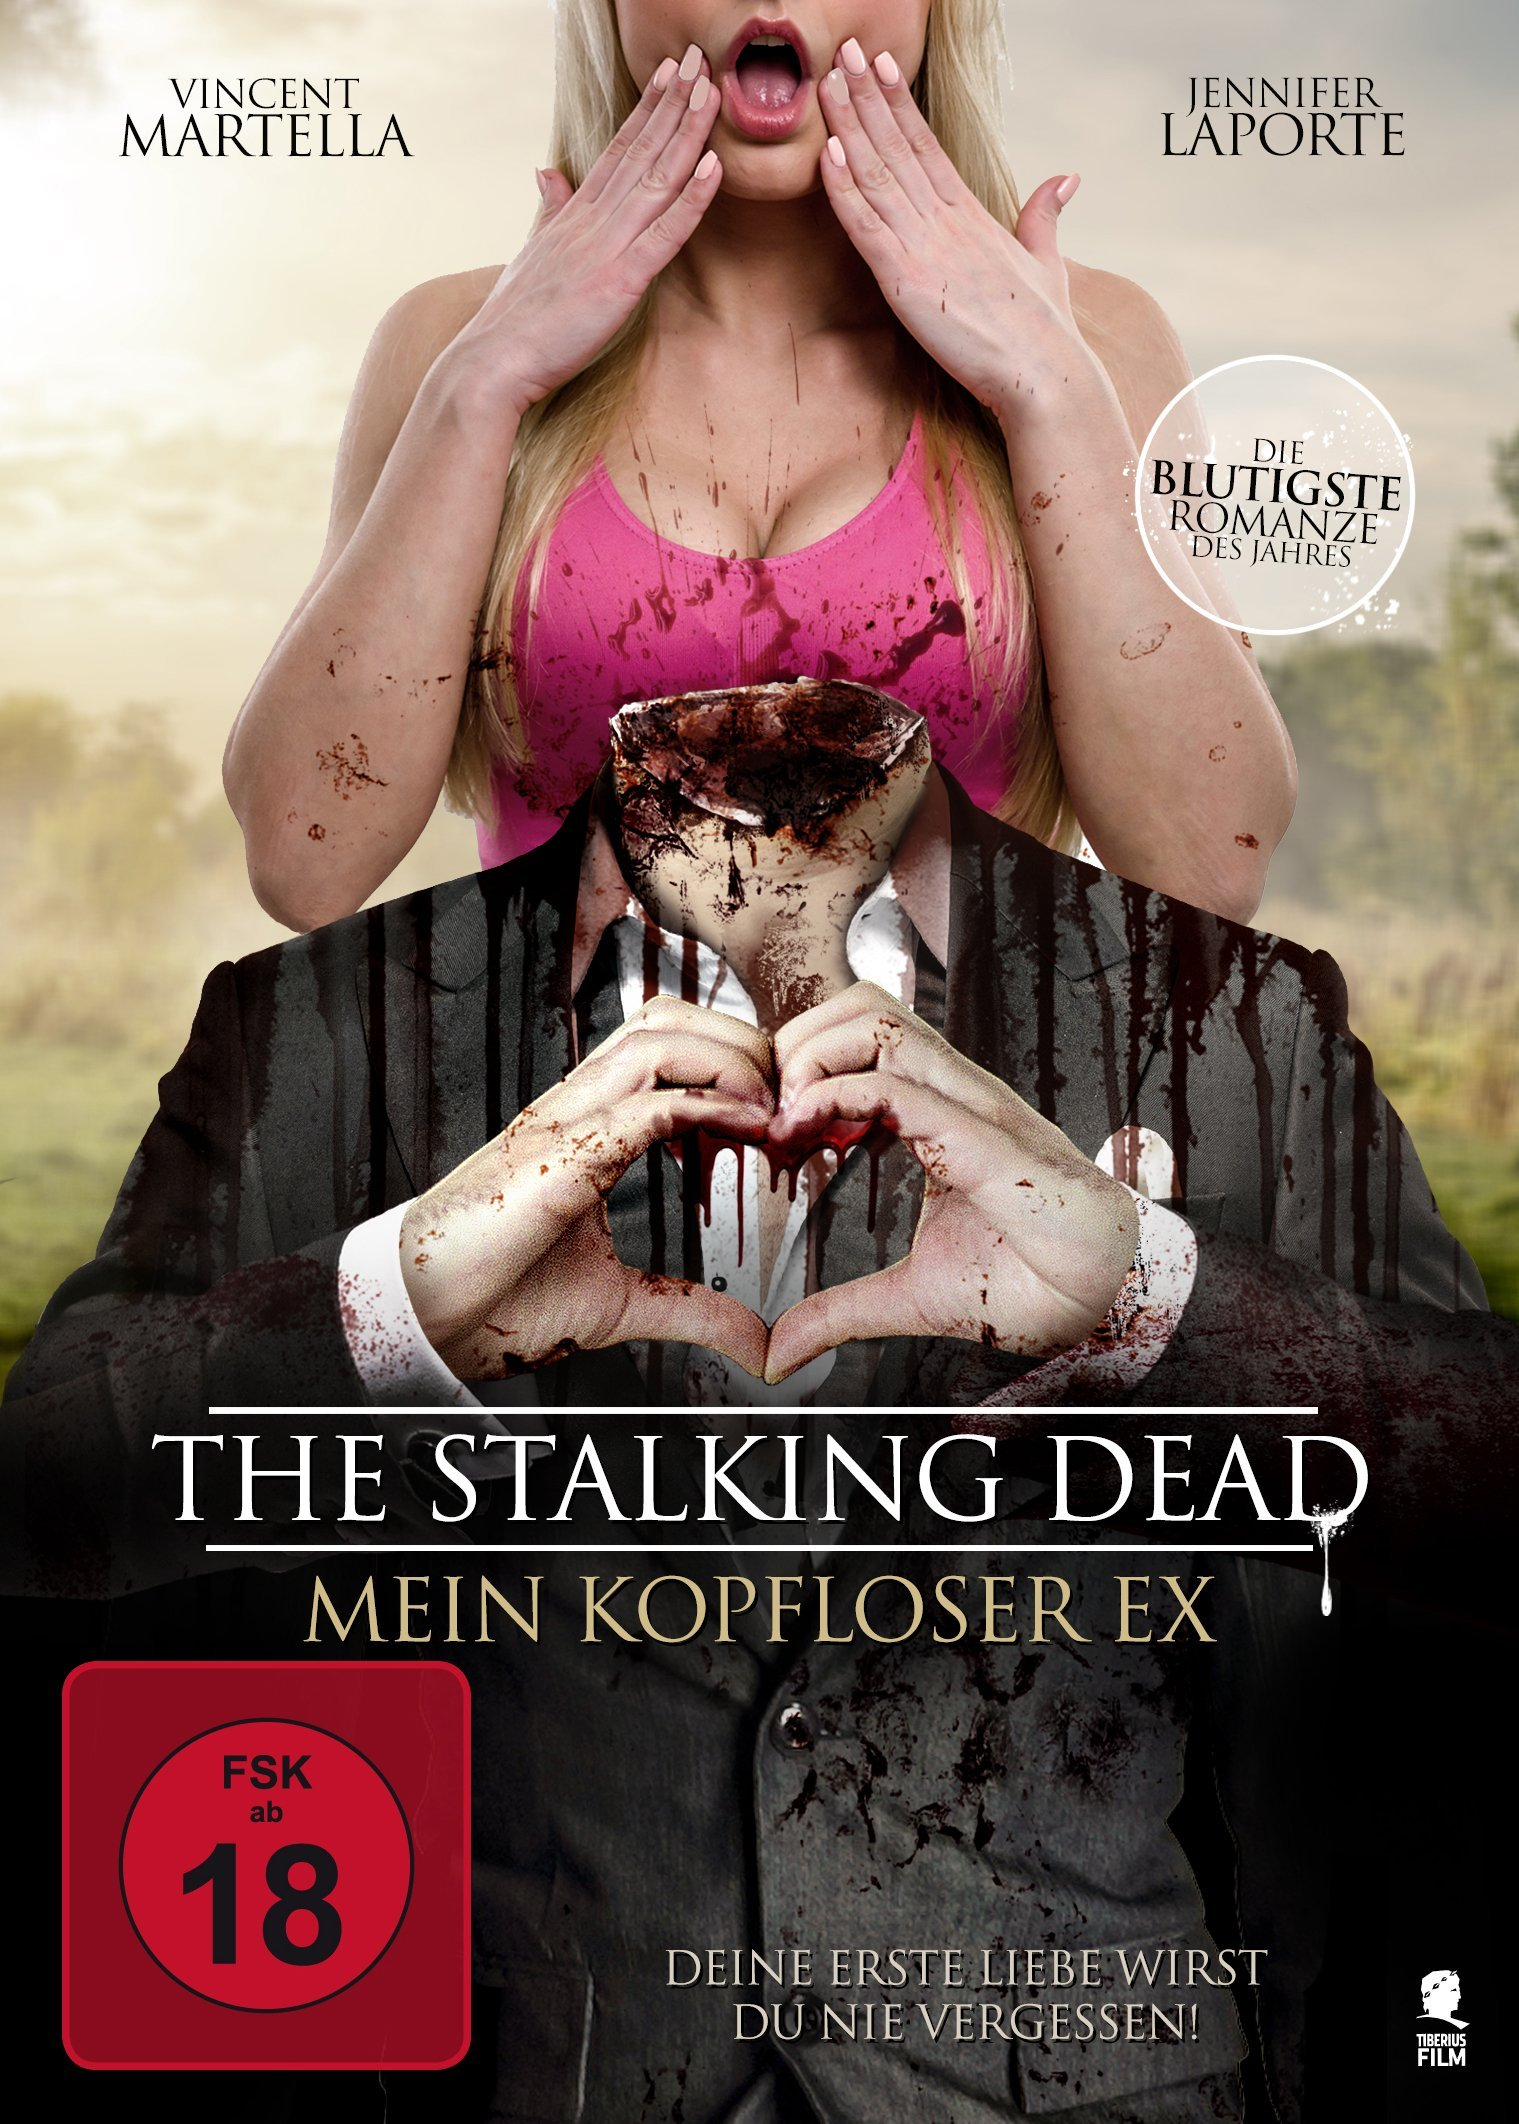 : The Stalking Dead Mein kopfloser Ex German 2015 Ac3 BdriP x264-Xf